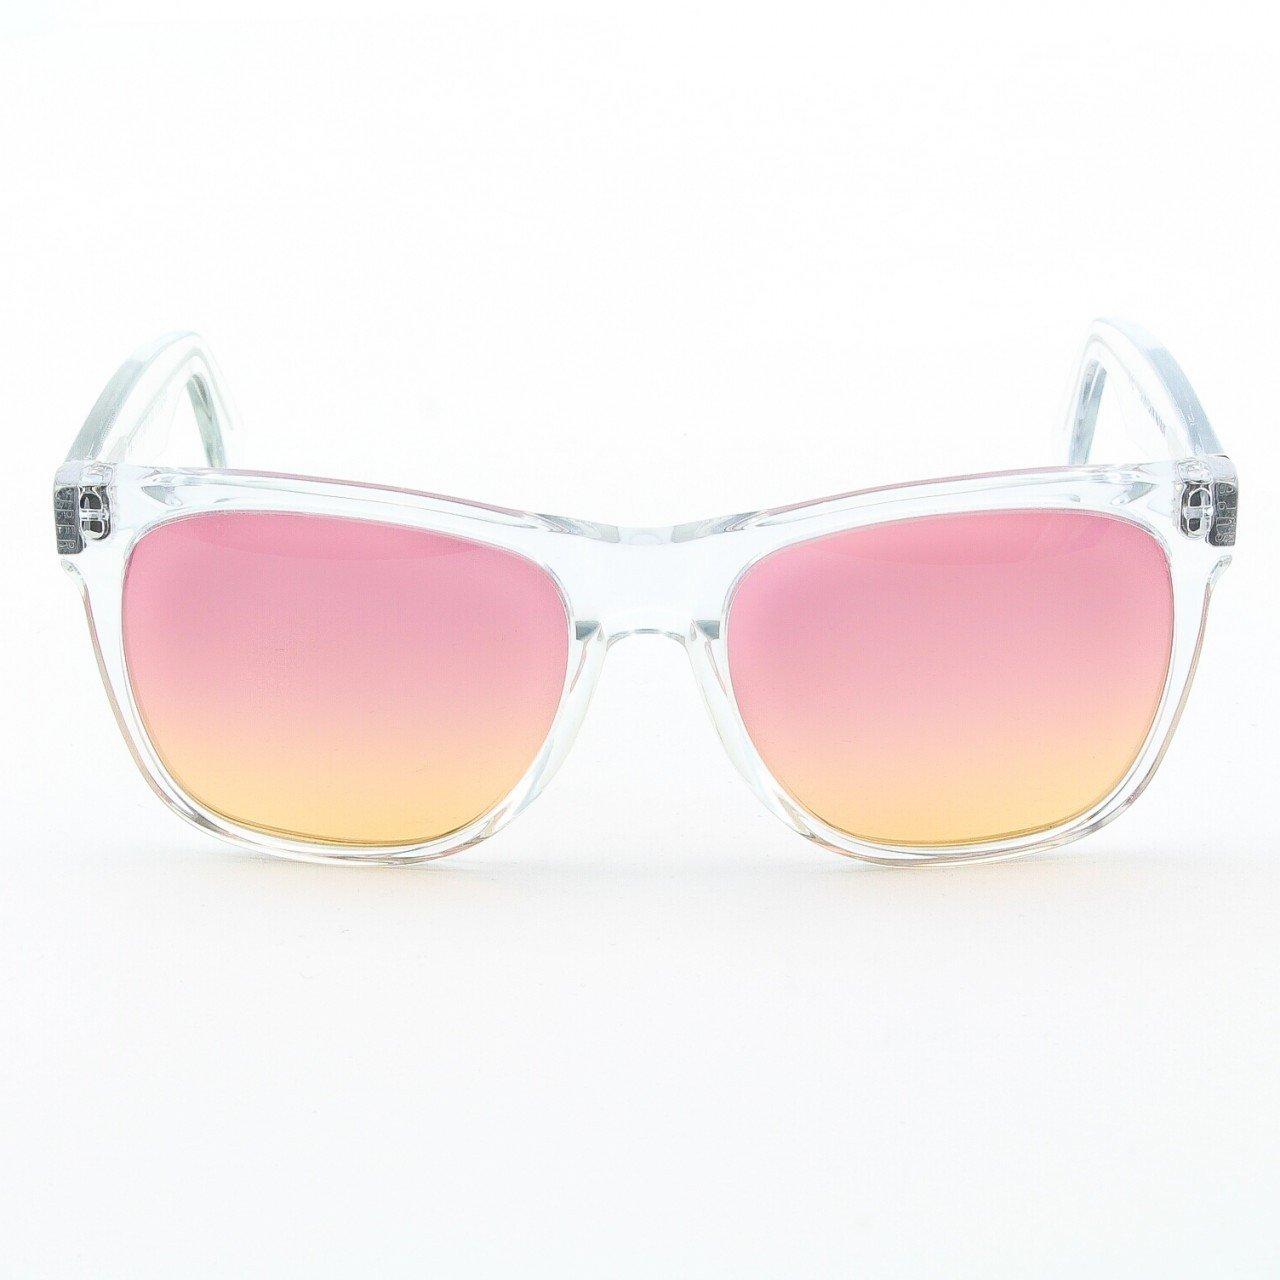 Super Classic 206 Wayfarer Sunglasses Clear with Pink Orange Gradient Lenses by RETROSUPERFUTURE